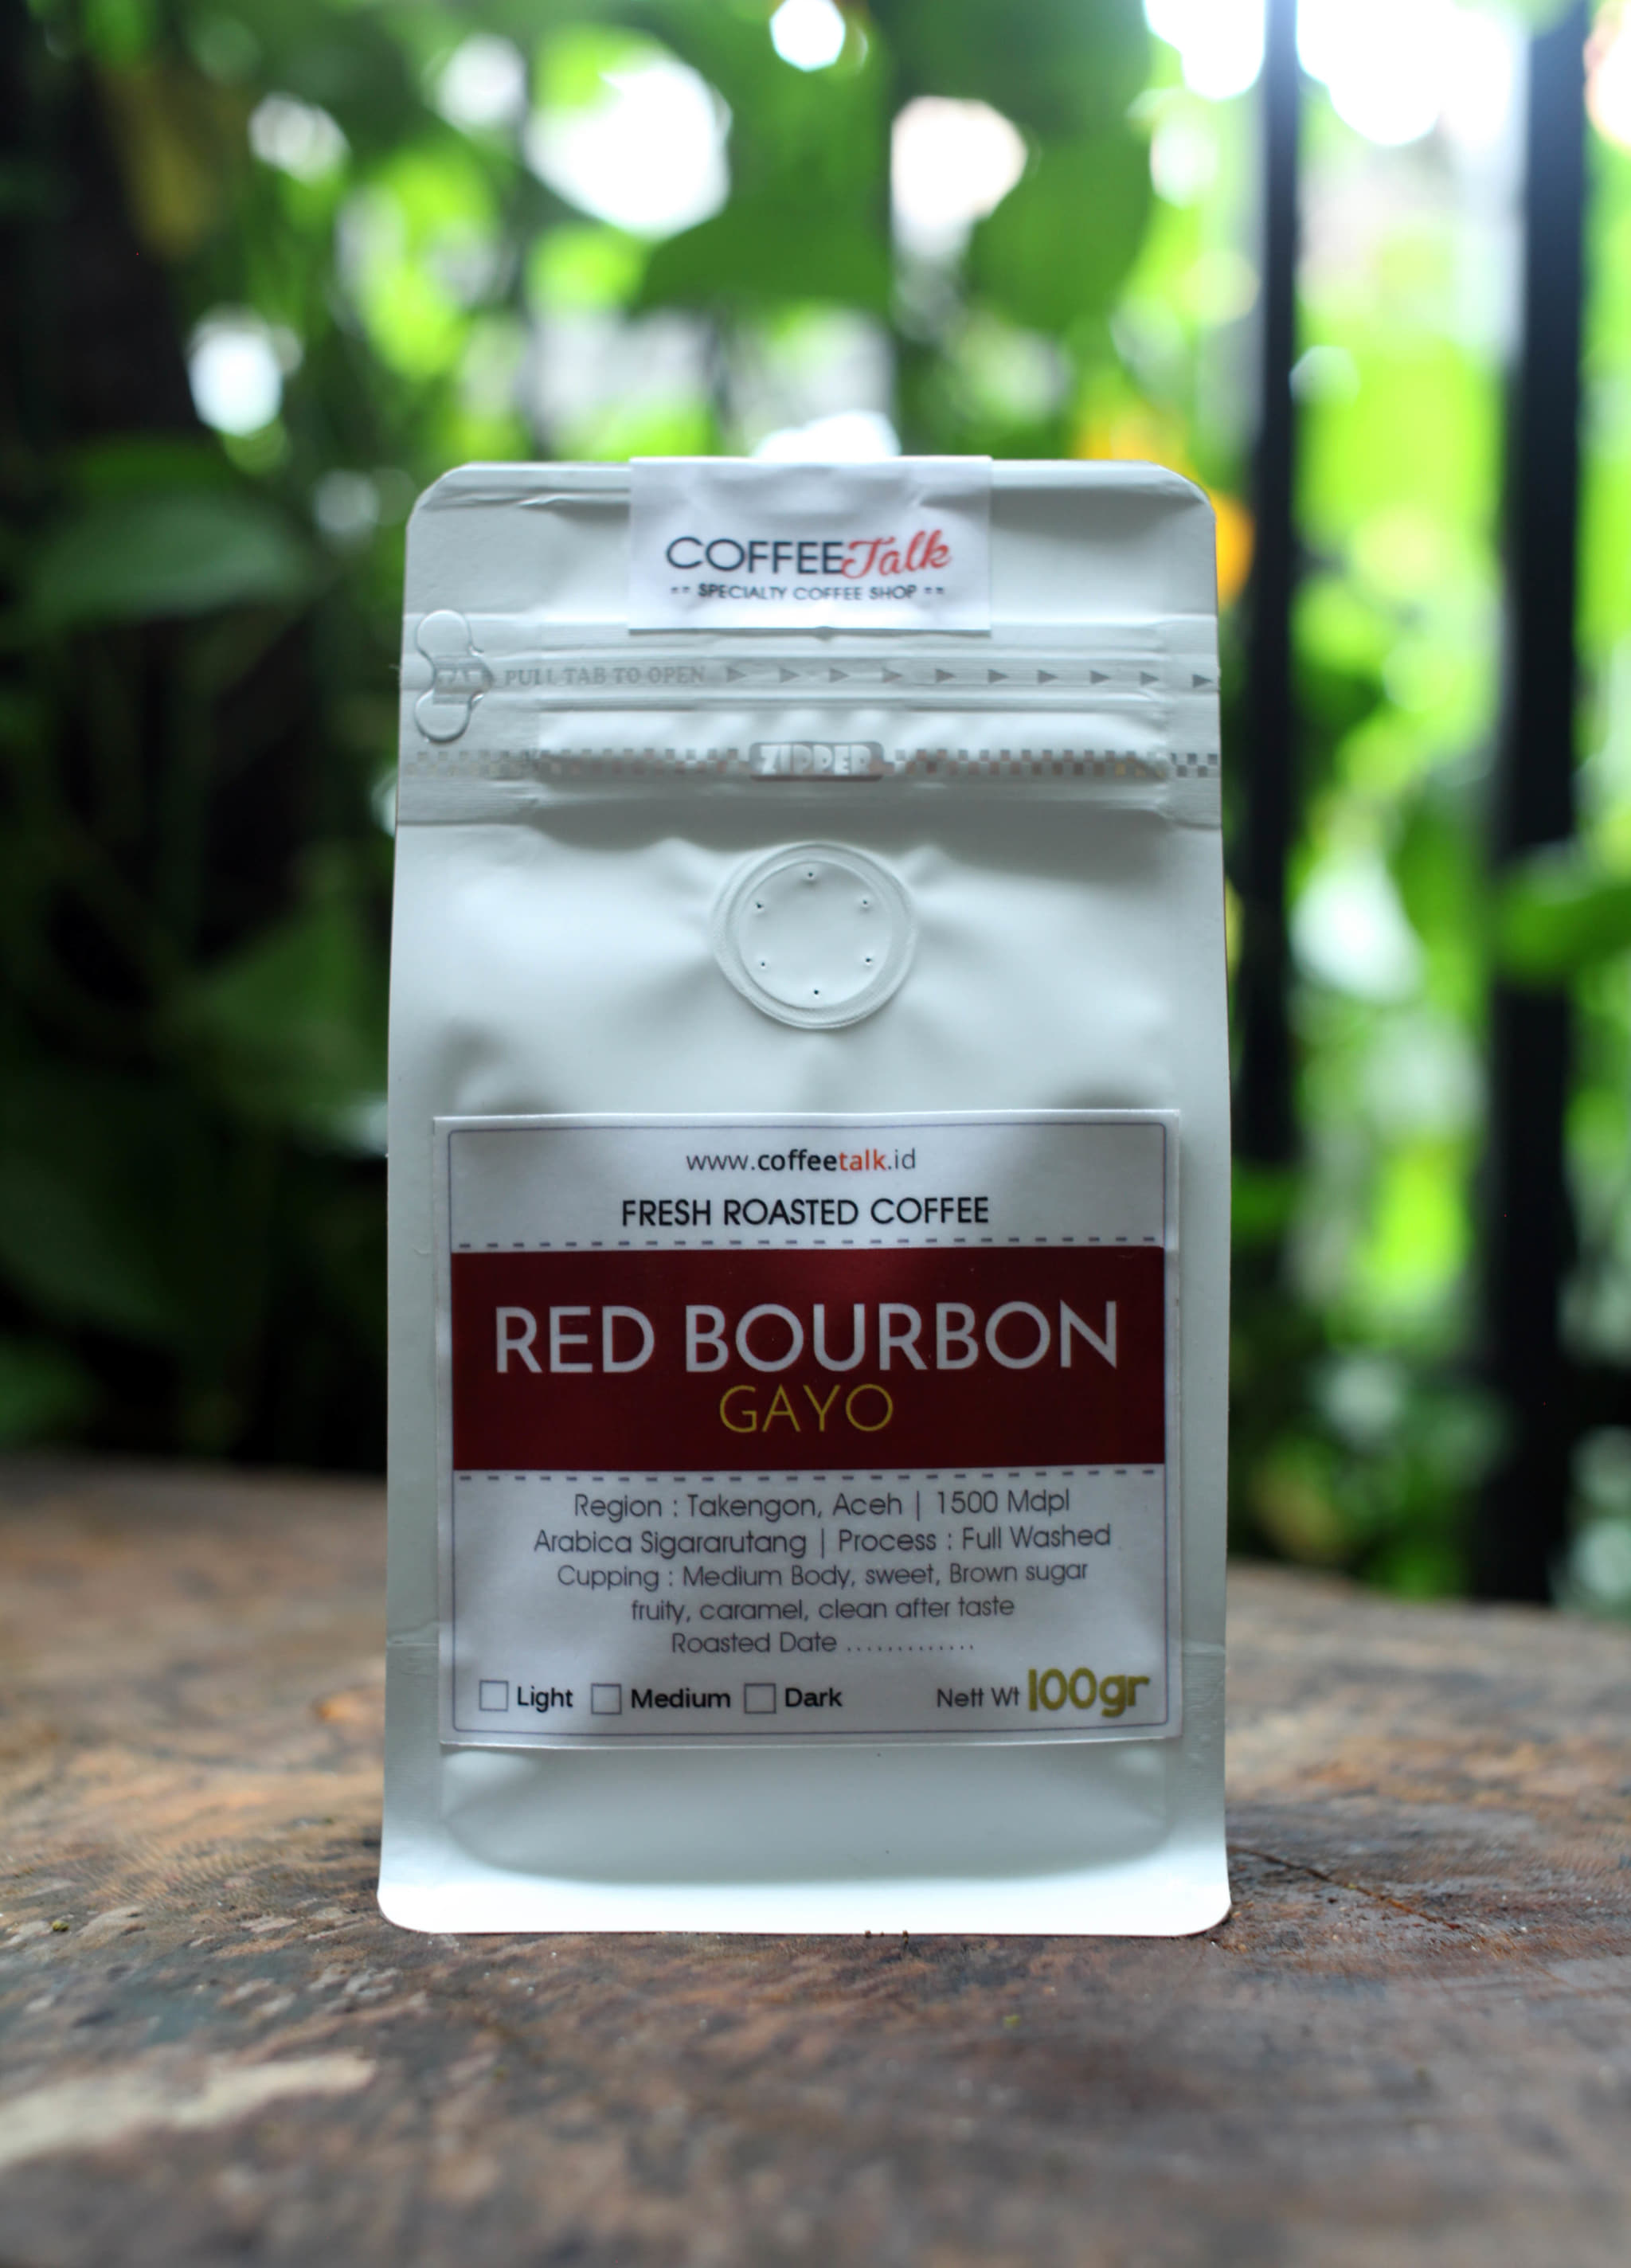 Daftar Harga Otten Coffee Arabica Peru El Huaco 200g Biji Bubuk Kopi Kerinci Kayo Sungai Penuh Natural Process Lintong Blue Batak 500g